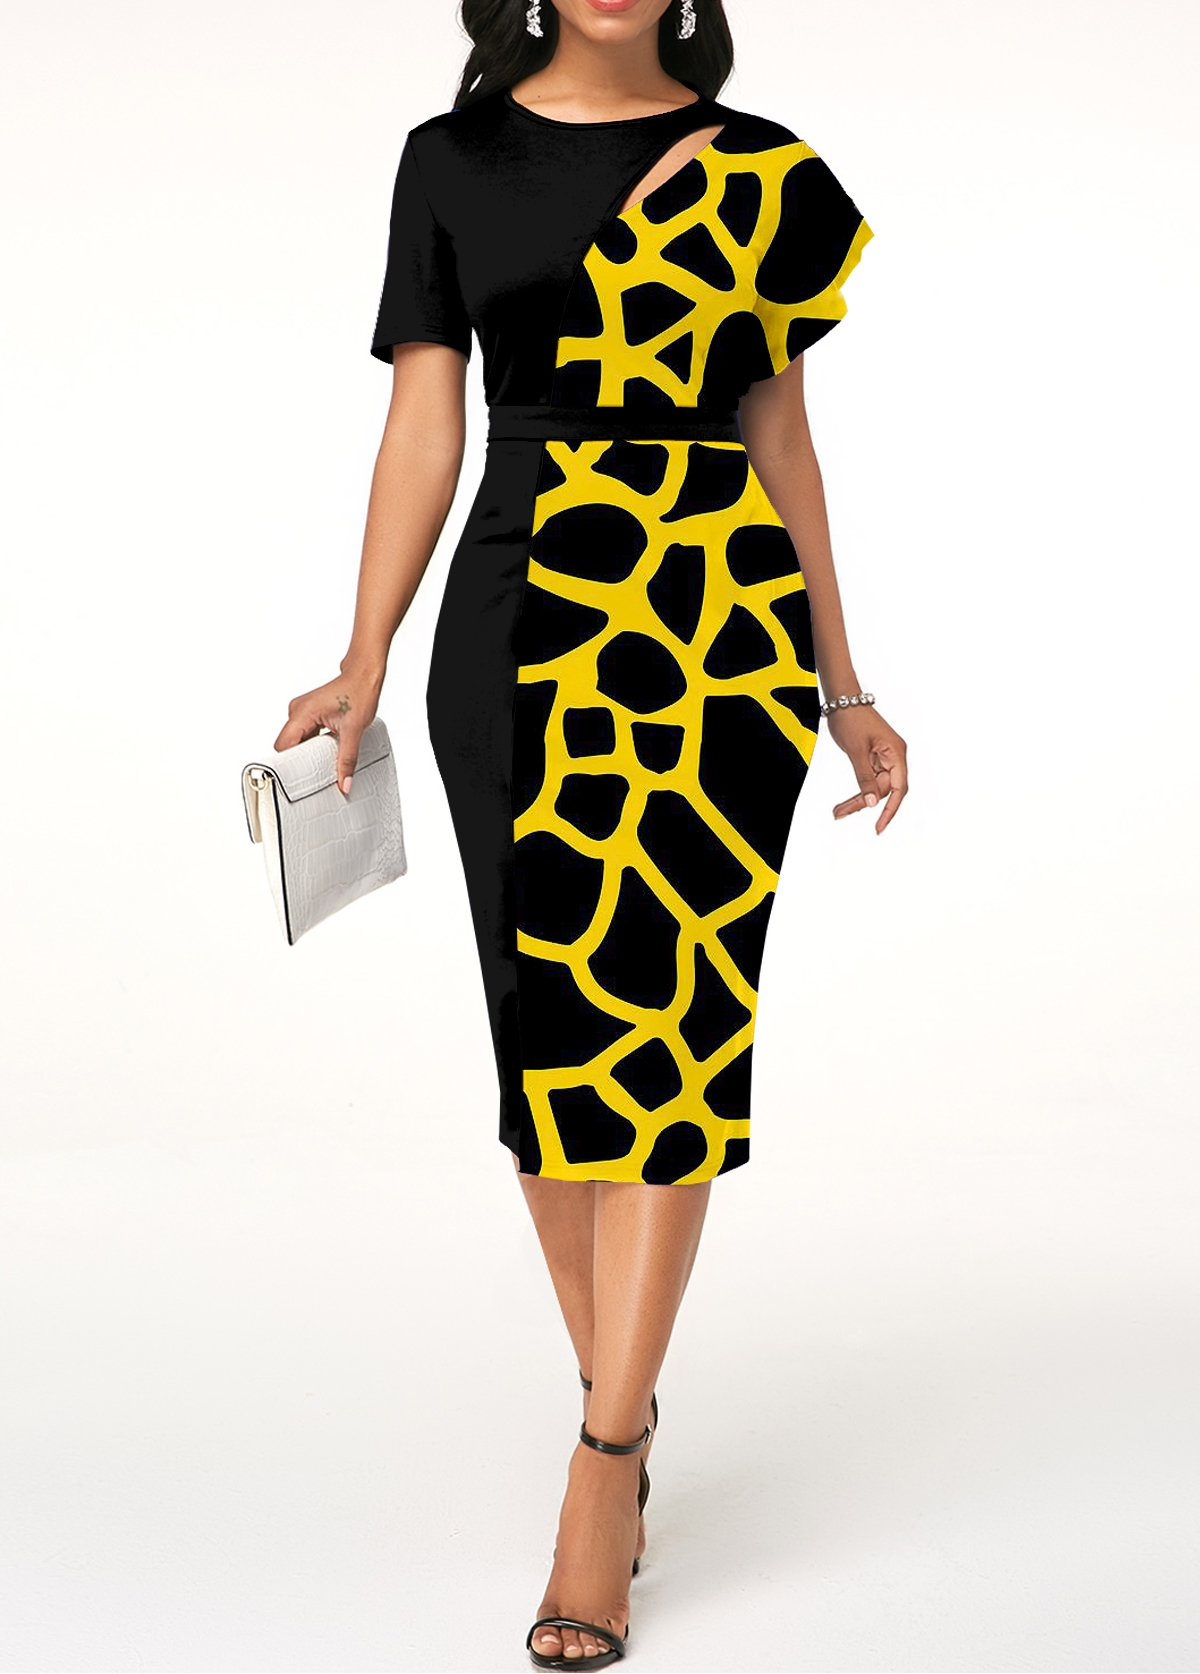 ROTITA Geometric Print Short Sleeve Bodycon Dress